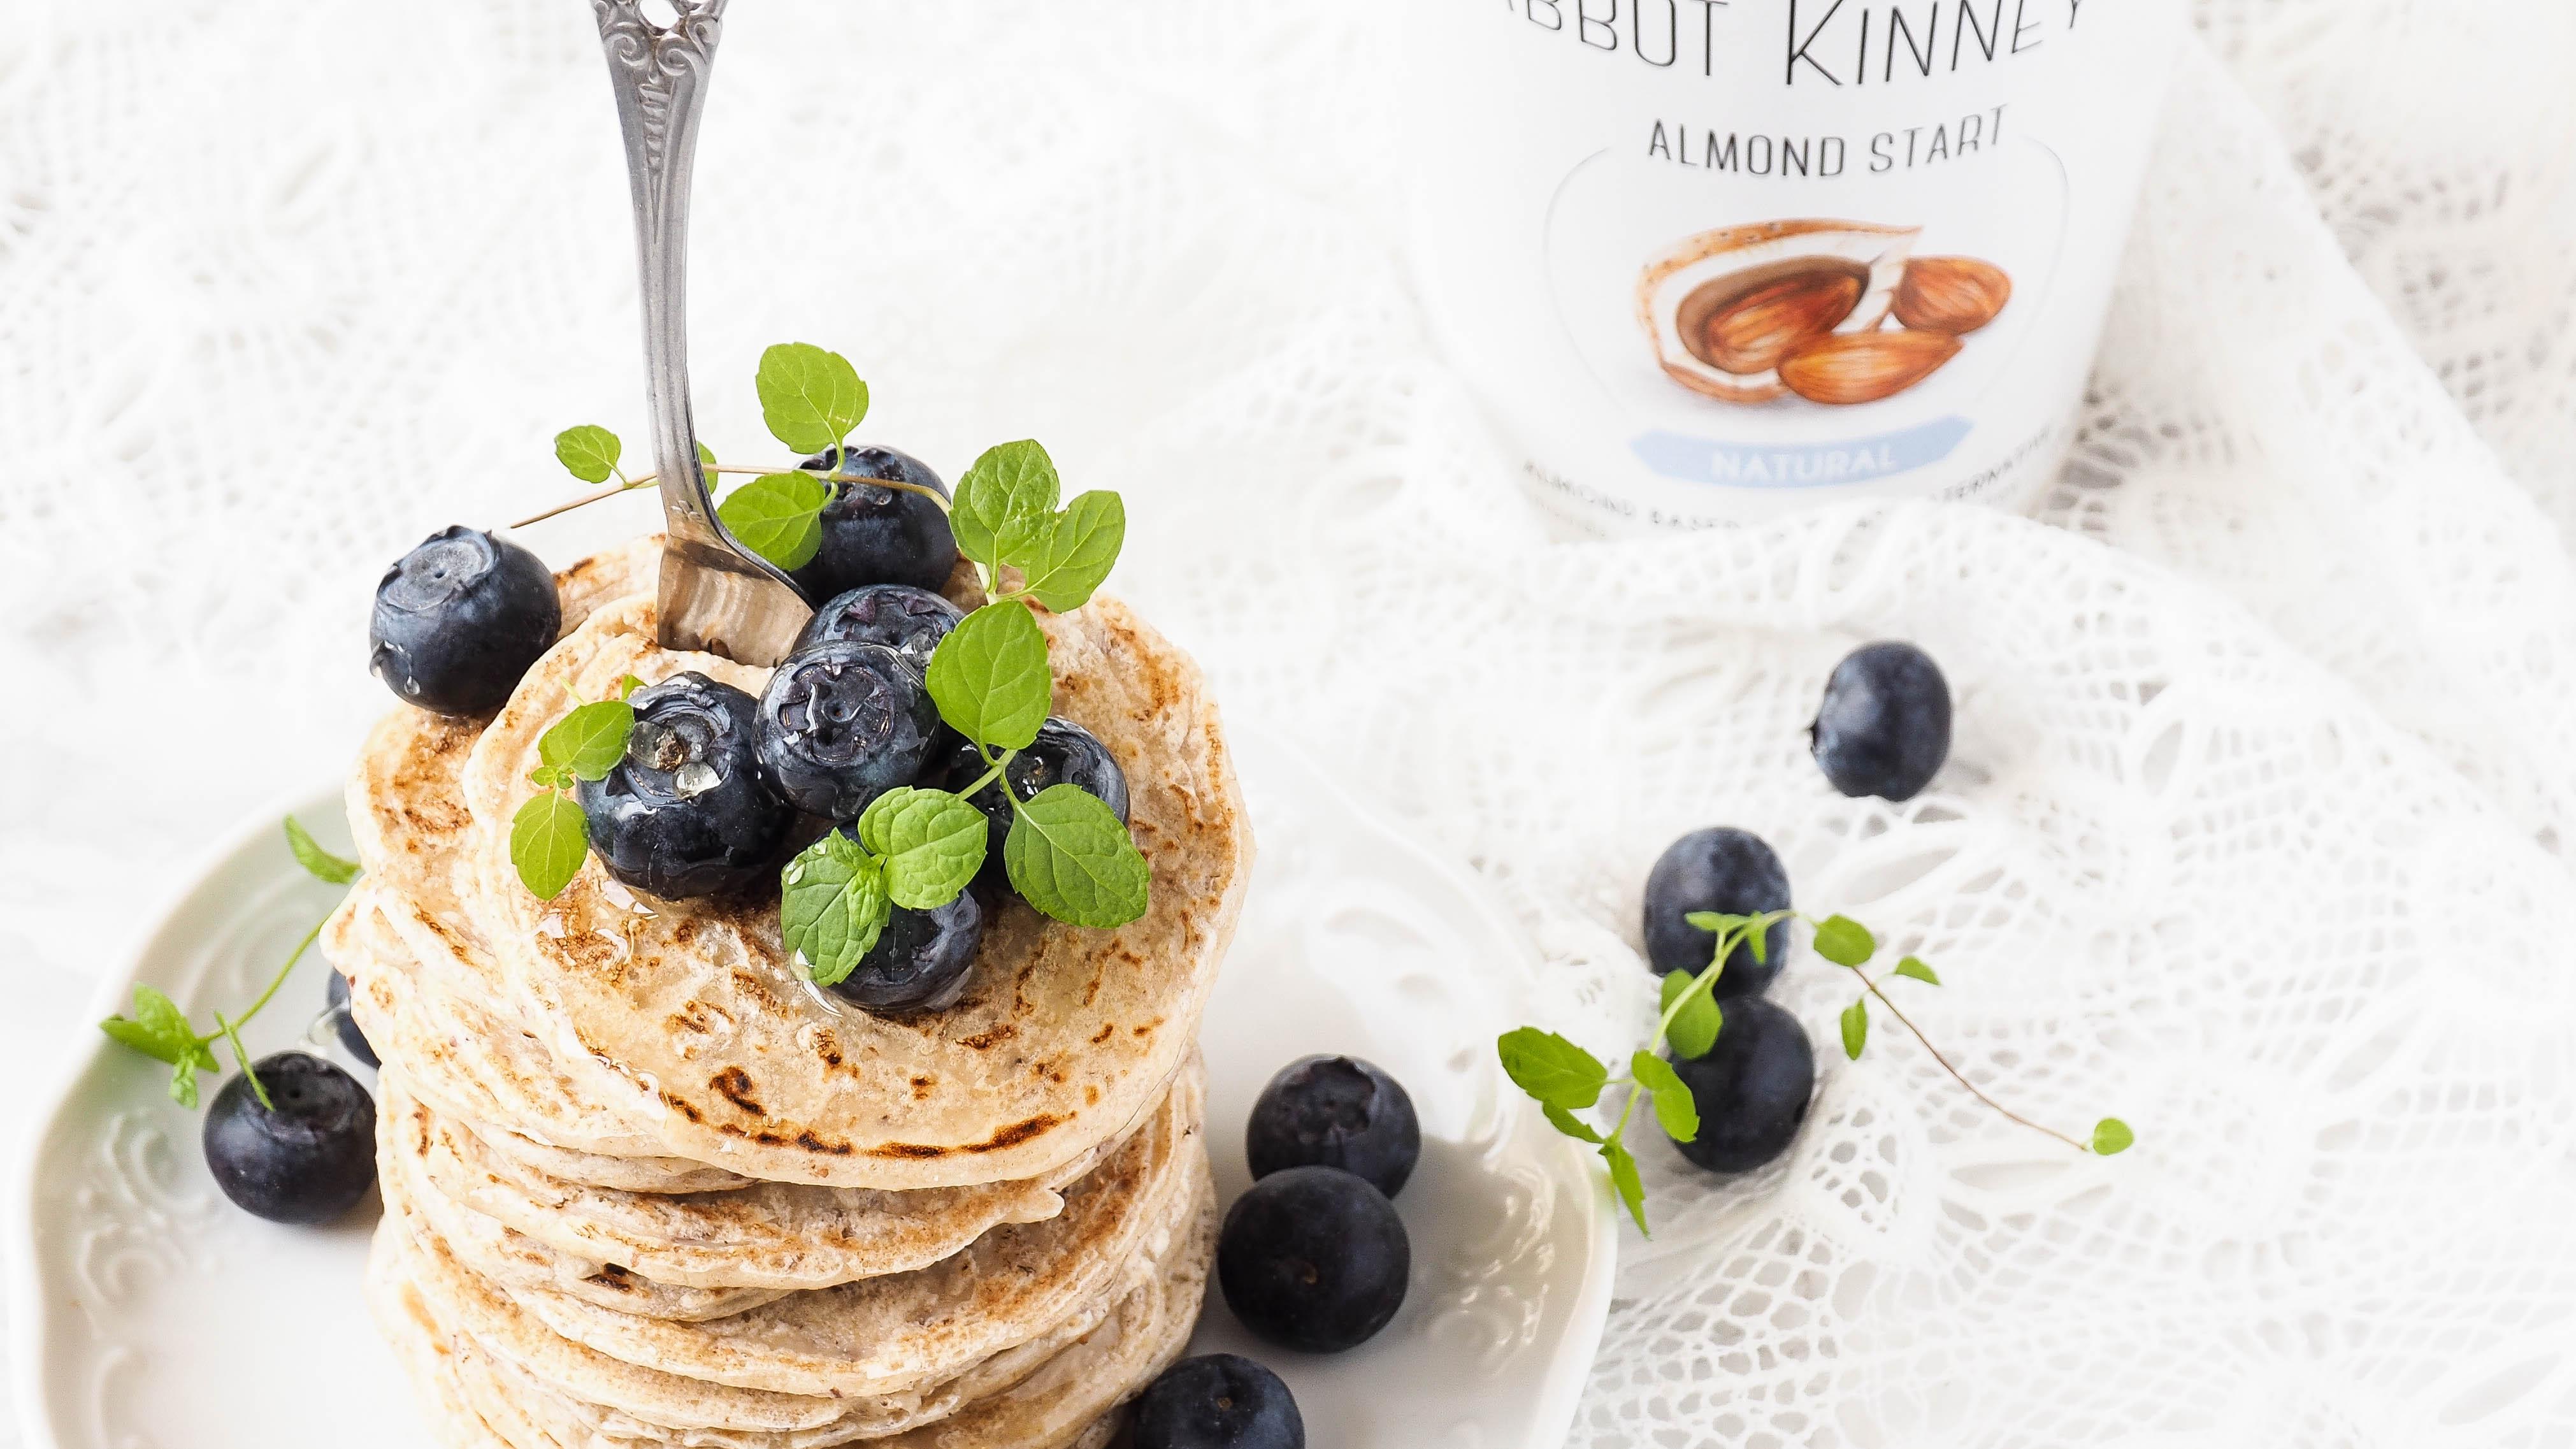 5x LKKRDR: Almond start pancakes